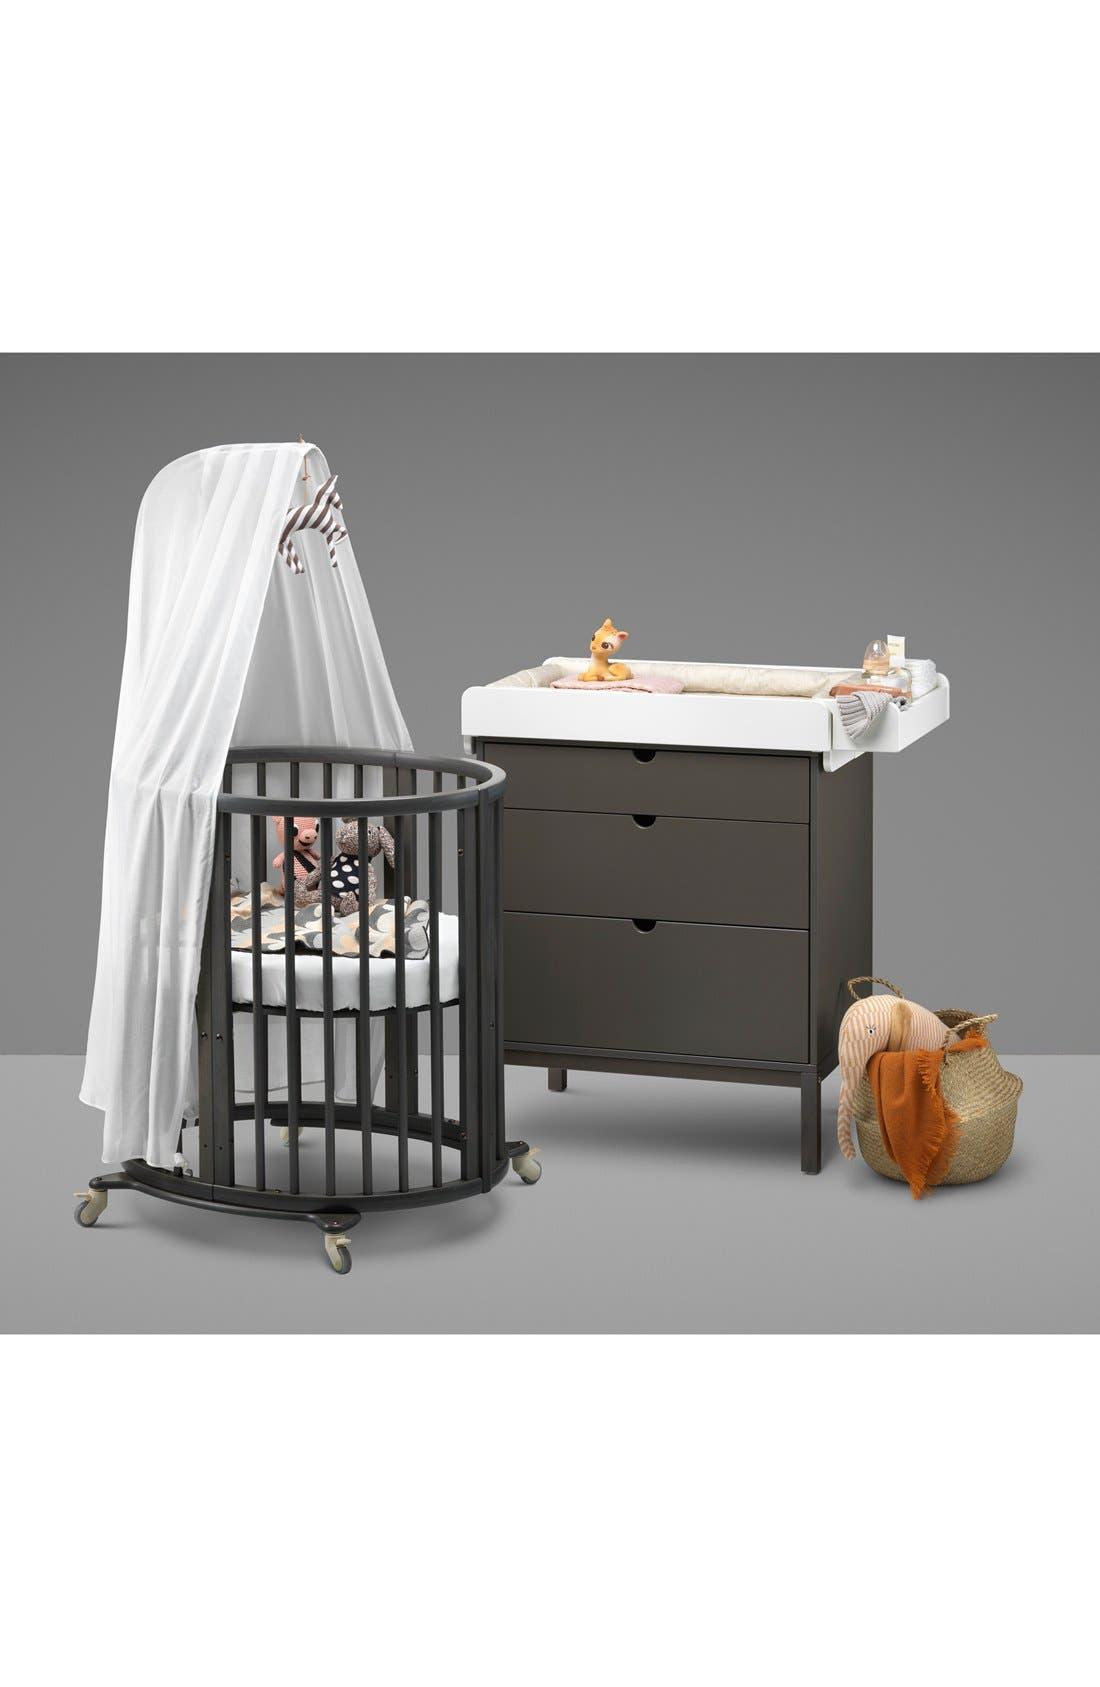 Convertible Sleepi Crib & Toddler Bed,                             Alternate thumbnail 2, color,                             HAZY GREY